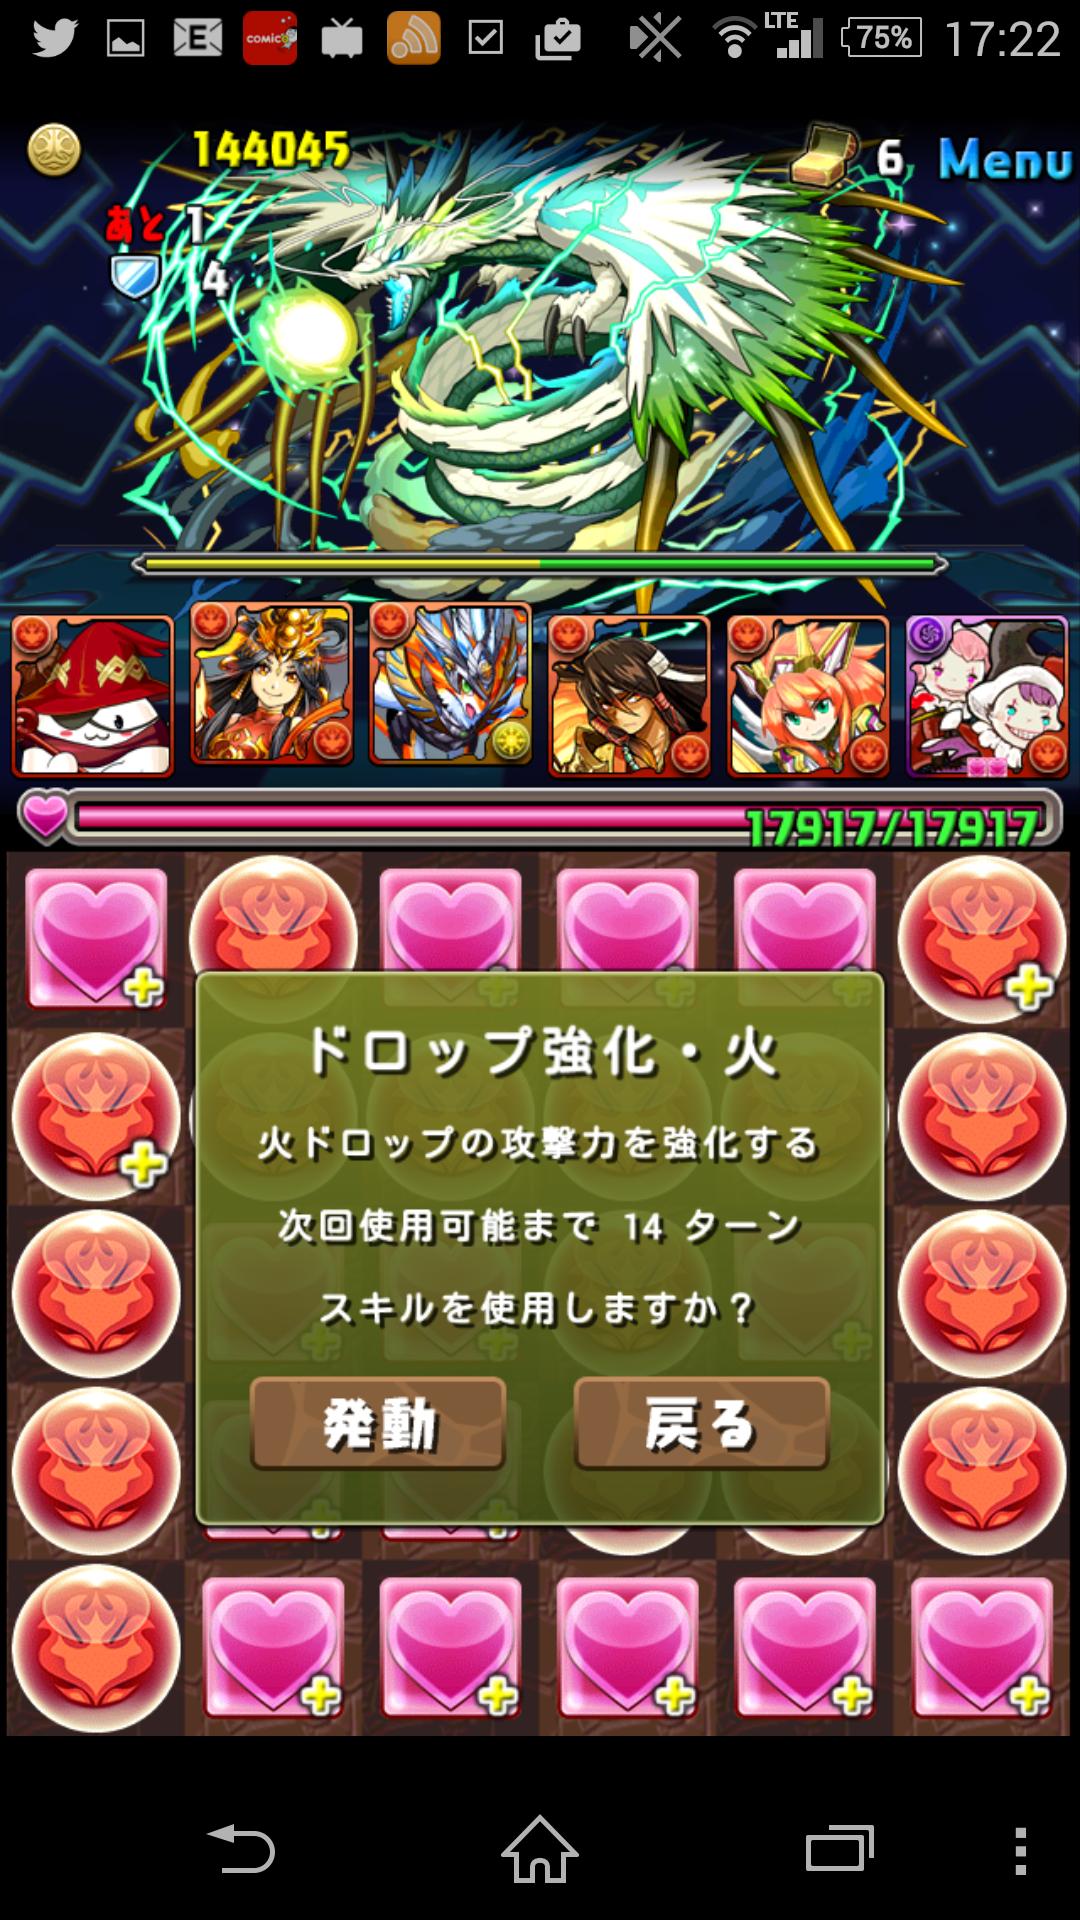 Screenshot_2015-03-21-17-22-54.png